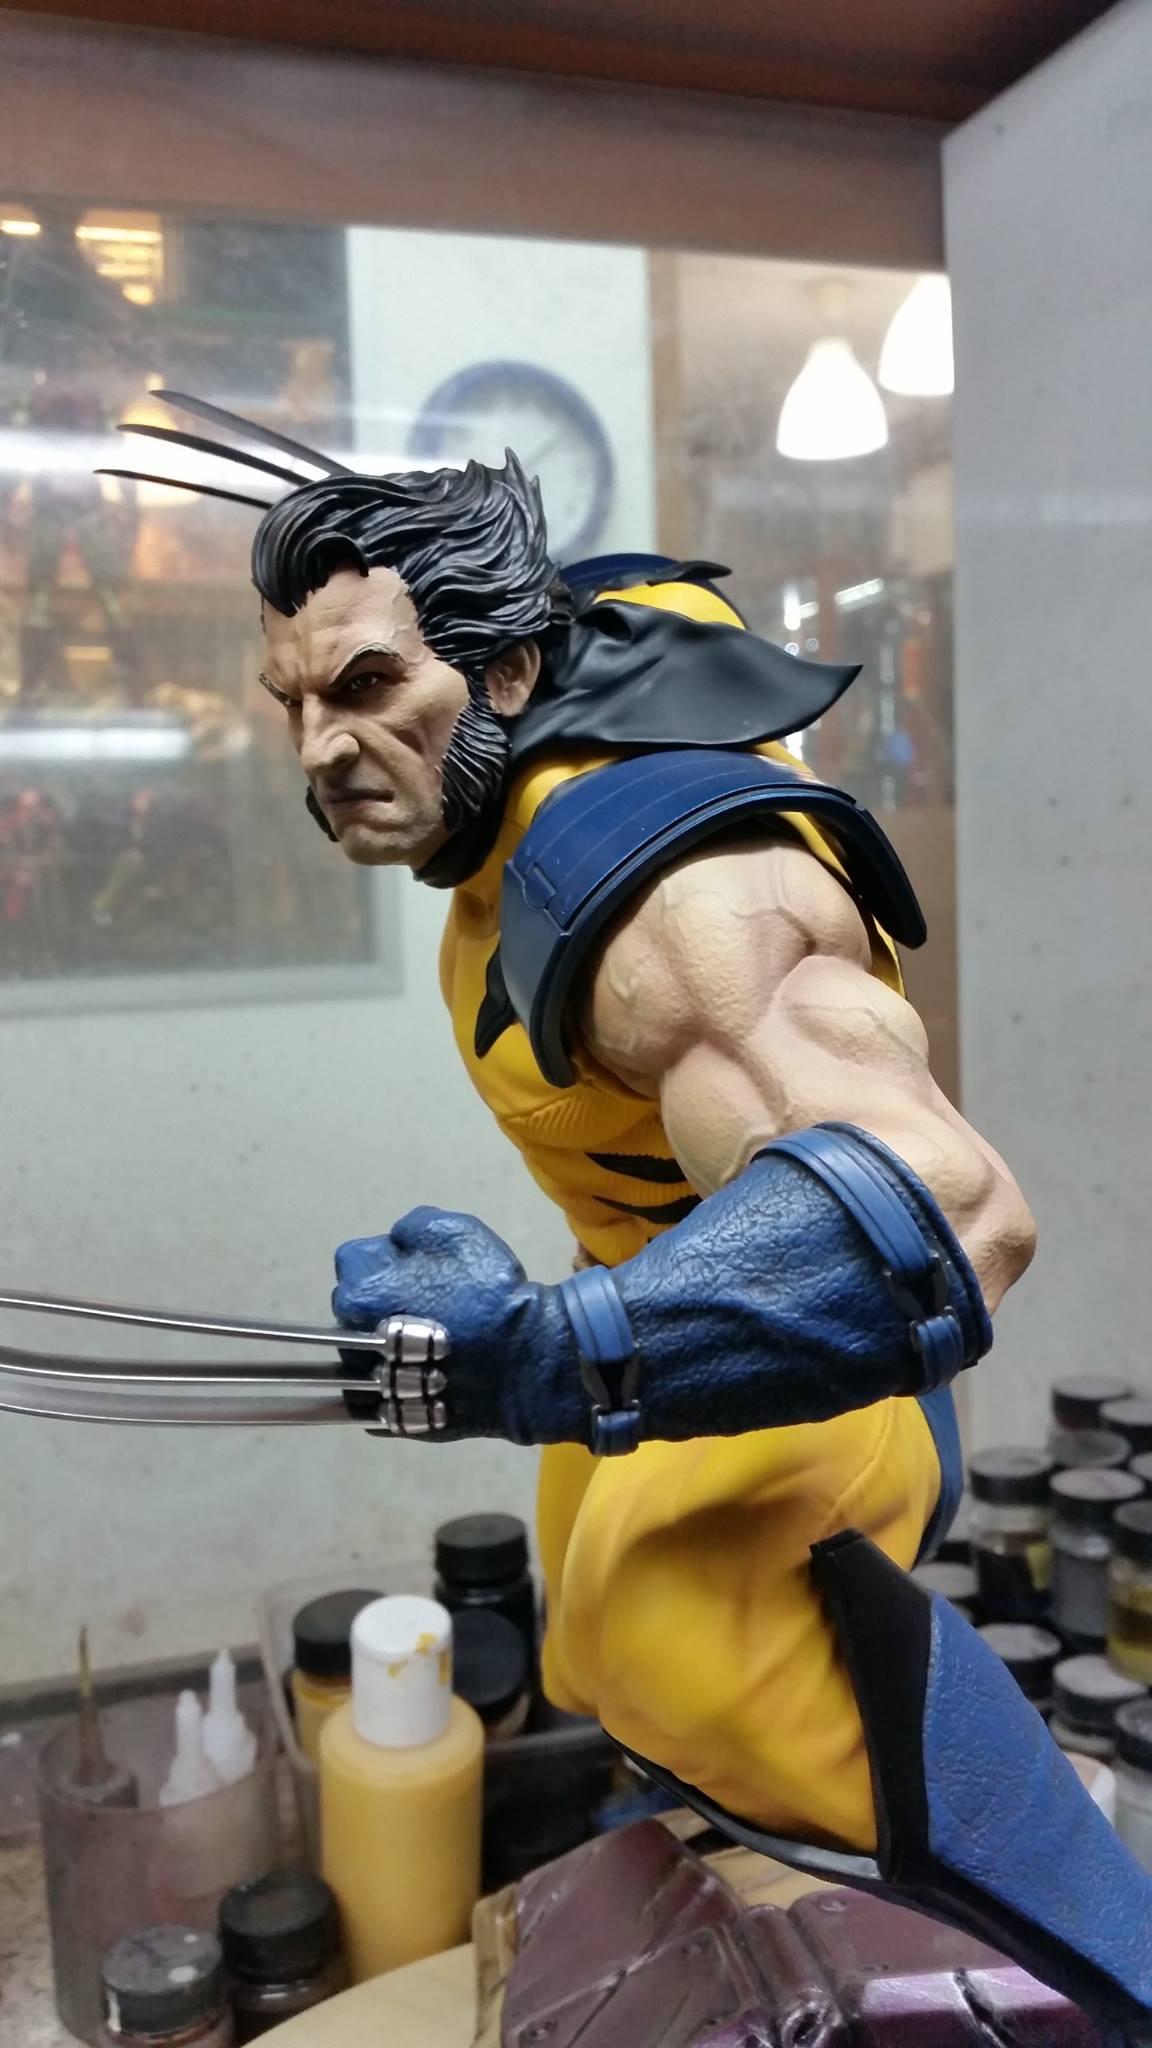 Premium Collectibles : Wolverine - Comics Version - Page 2 264592105116641417109121843116286511968617763312o